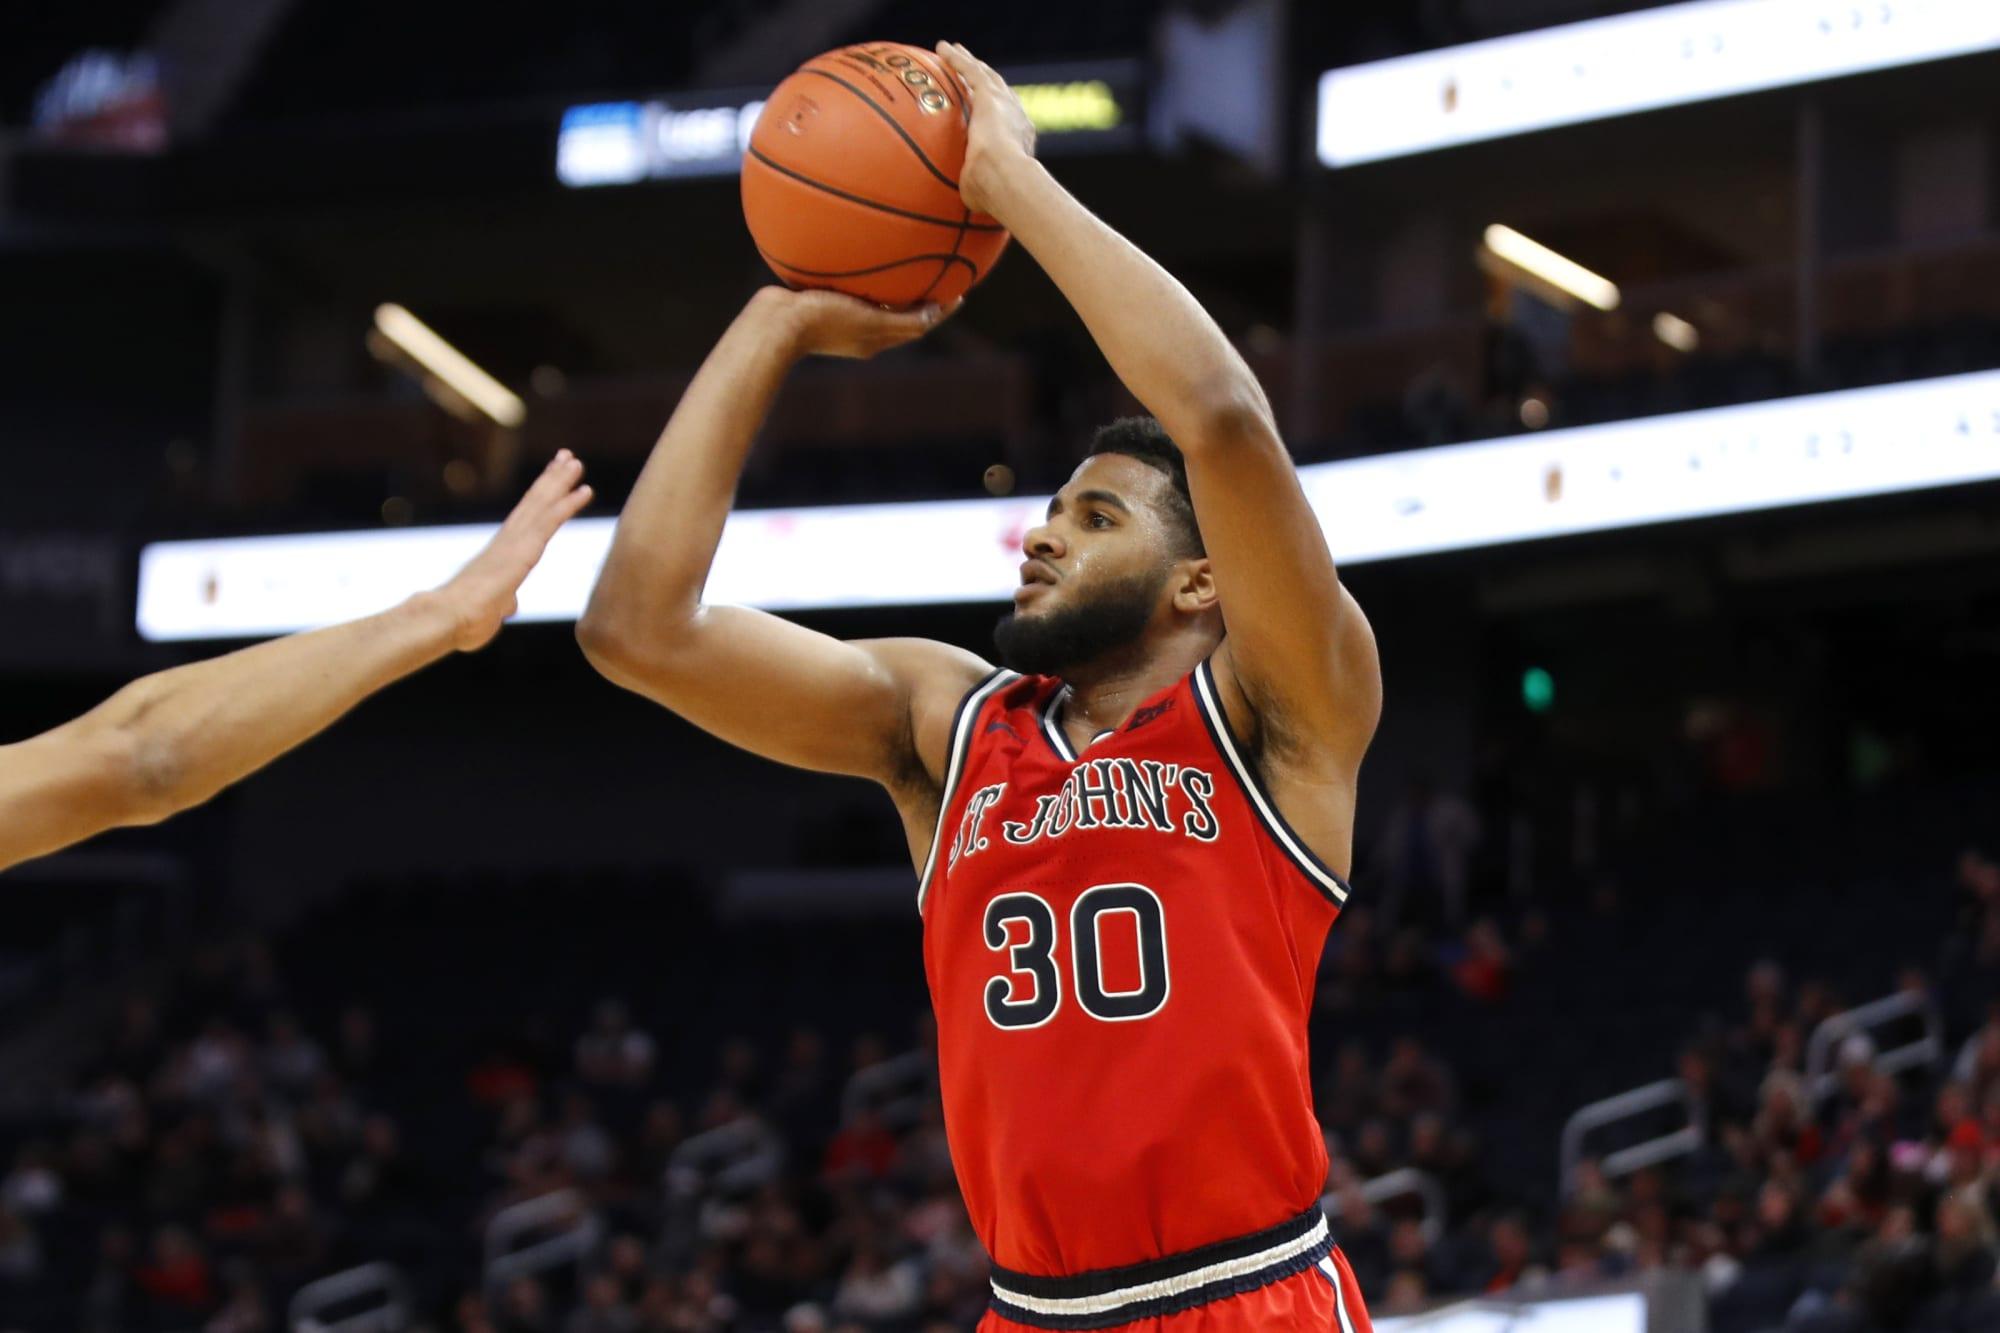 Ex-St. John's basketball standout LJ Figueroa receives eligibility waiver